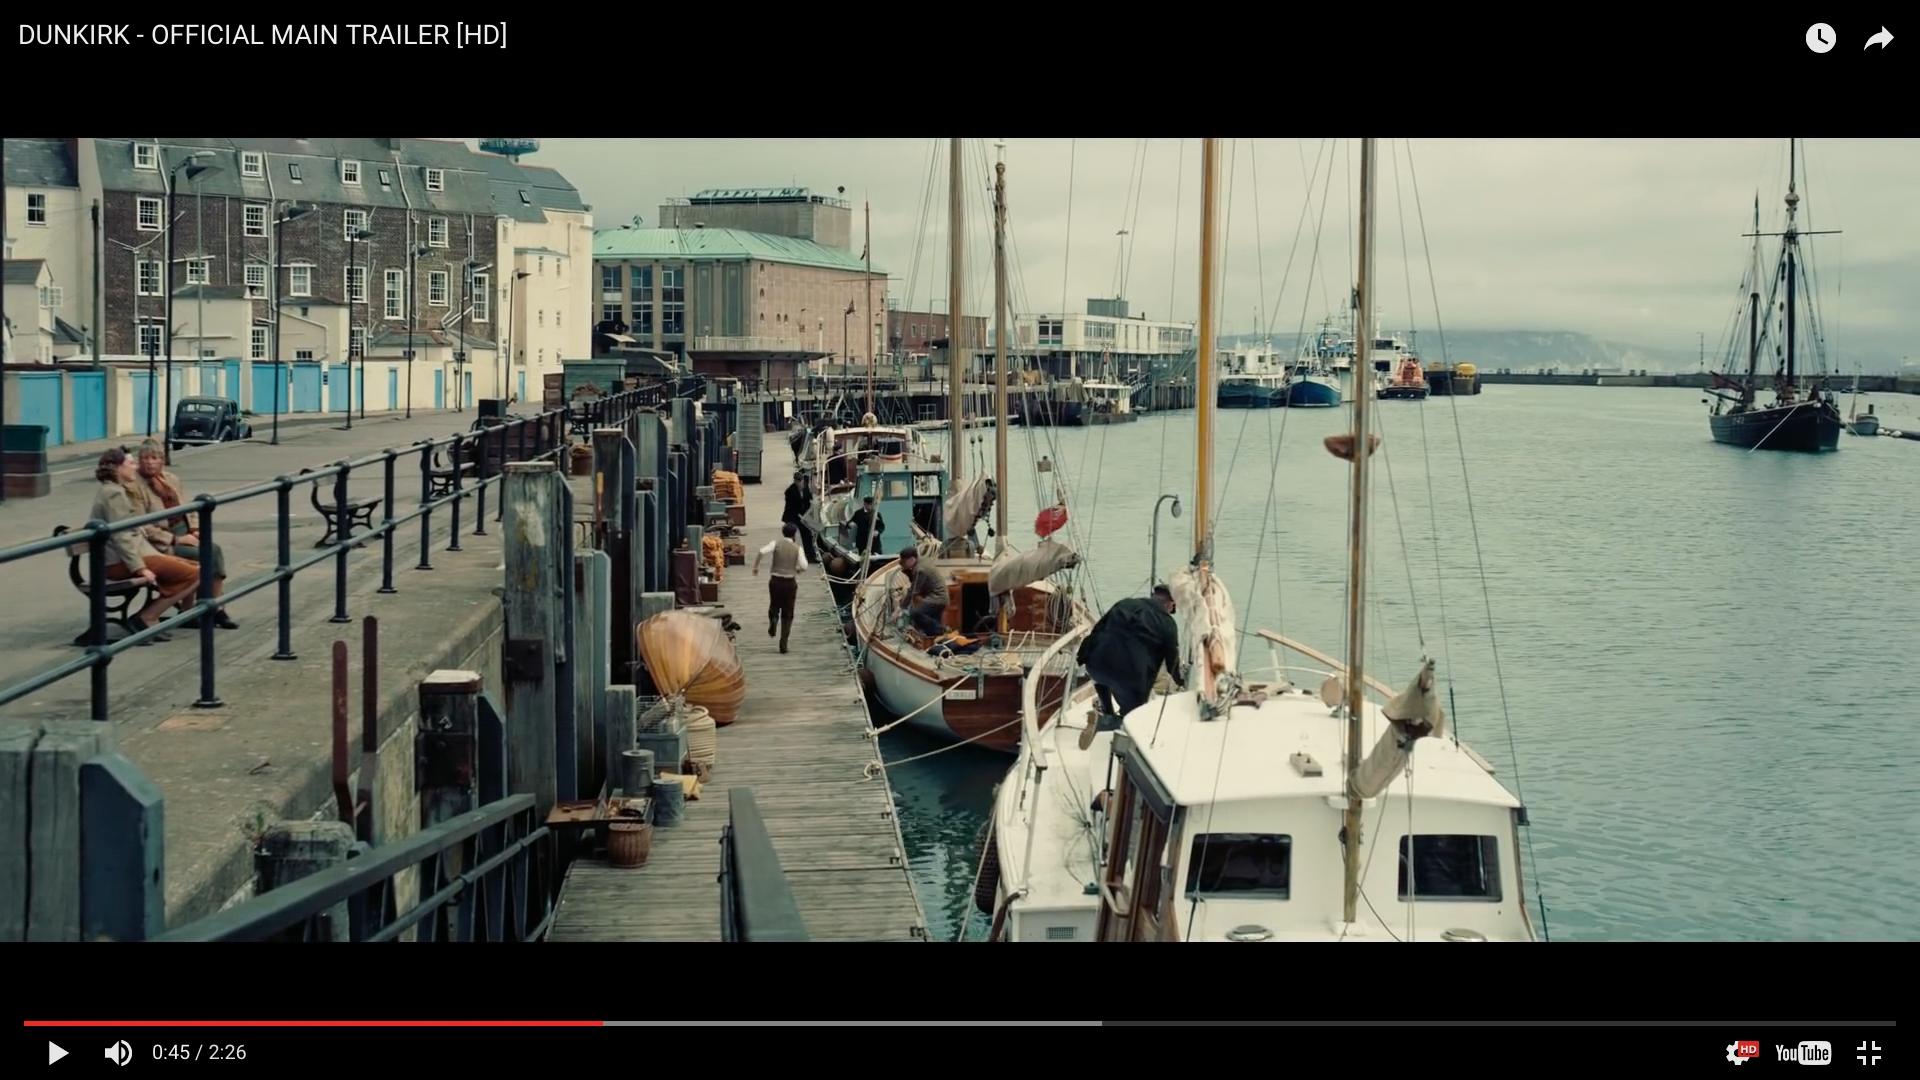 Dunkirk Movie, Christopher Nolan, Weymouth Harbour